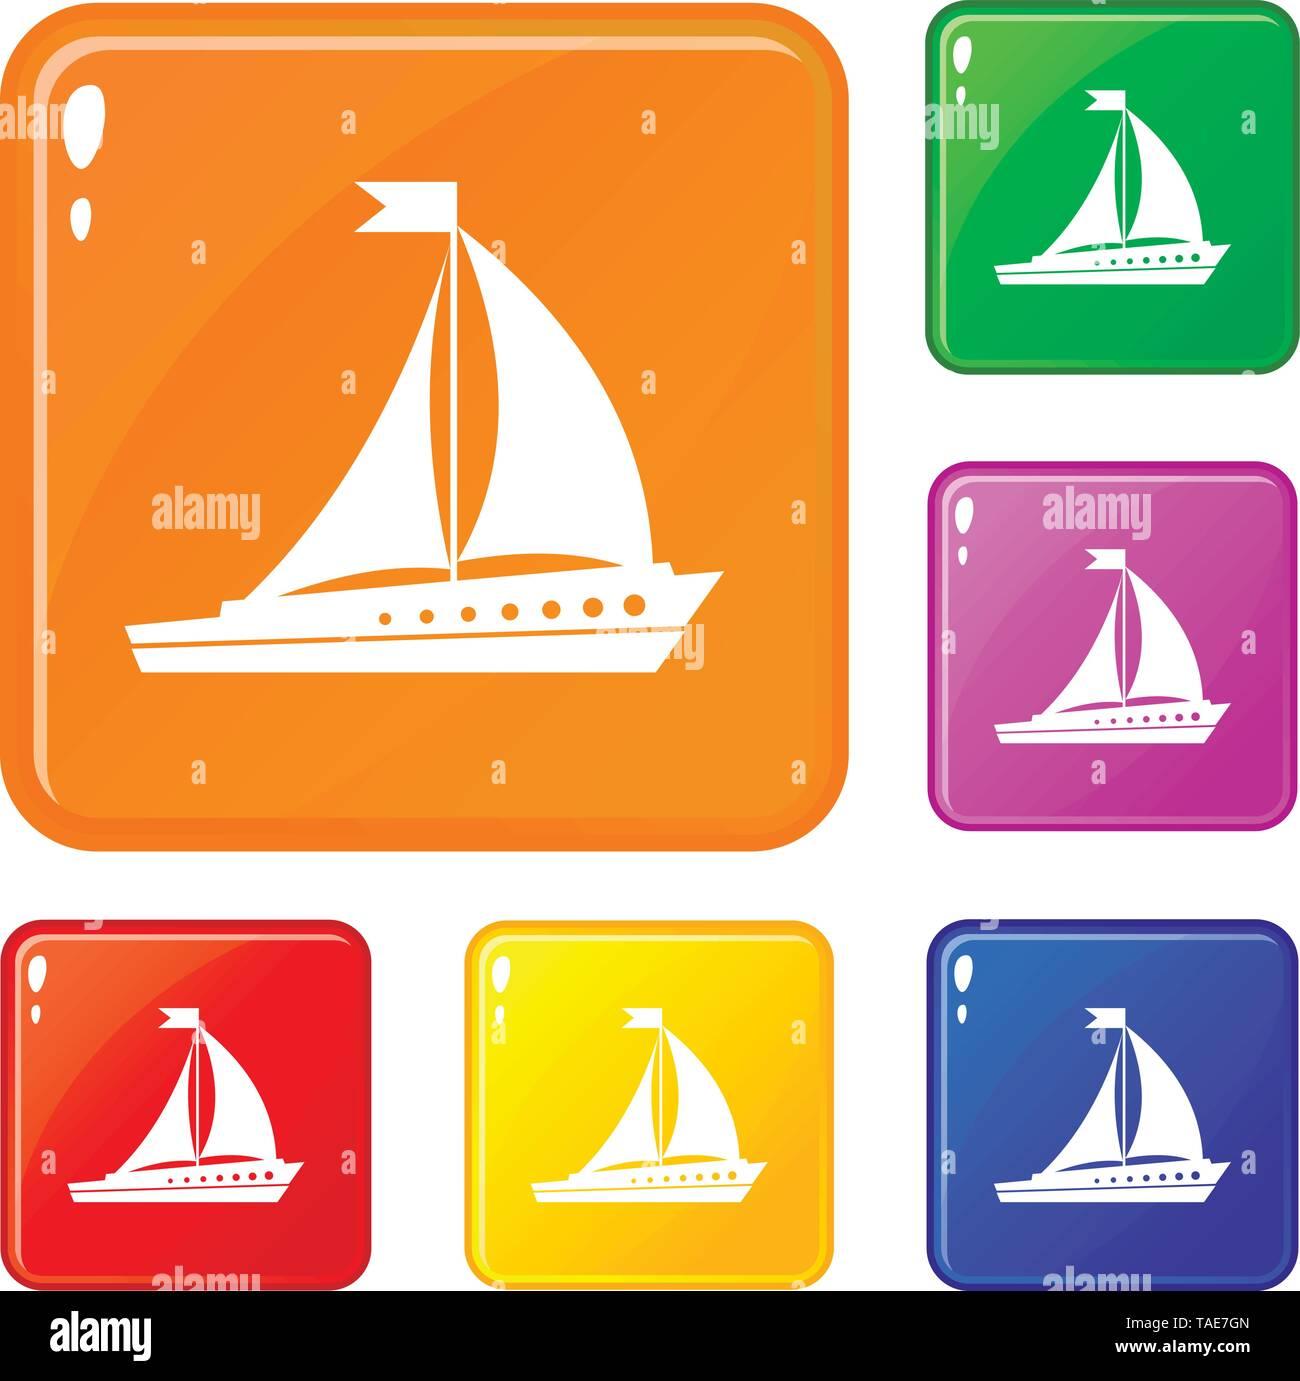 Sailing ship icons set vector color - Stock Image